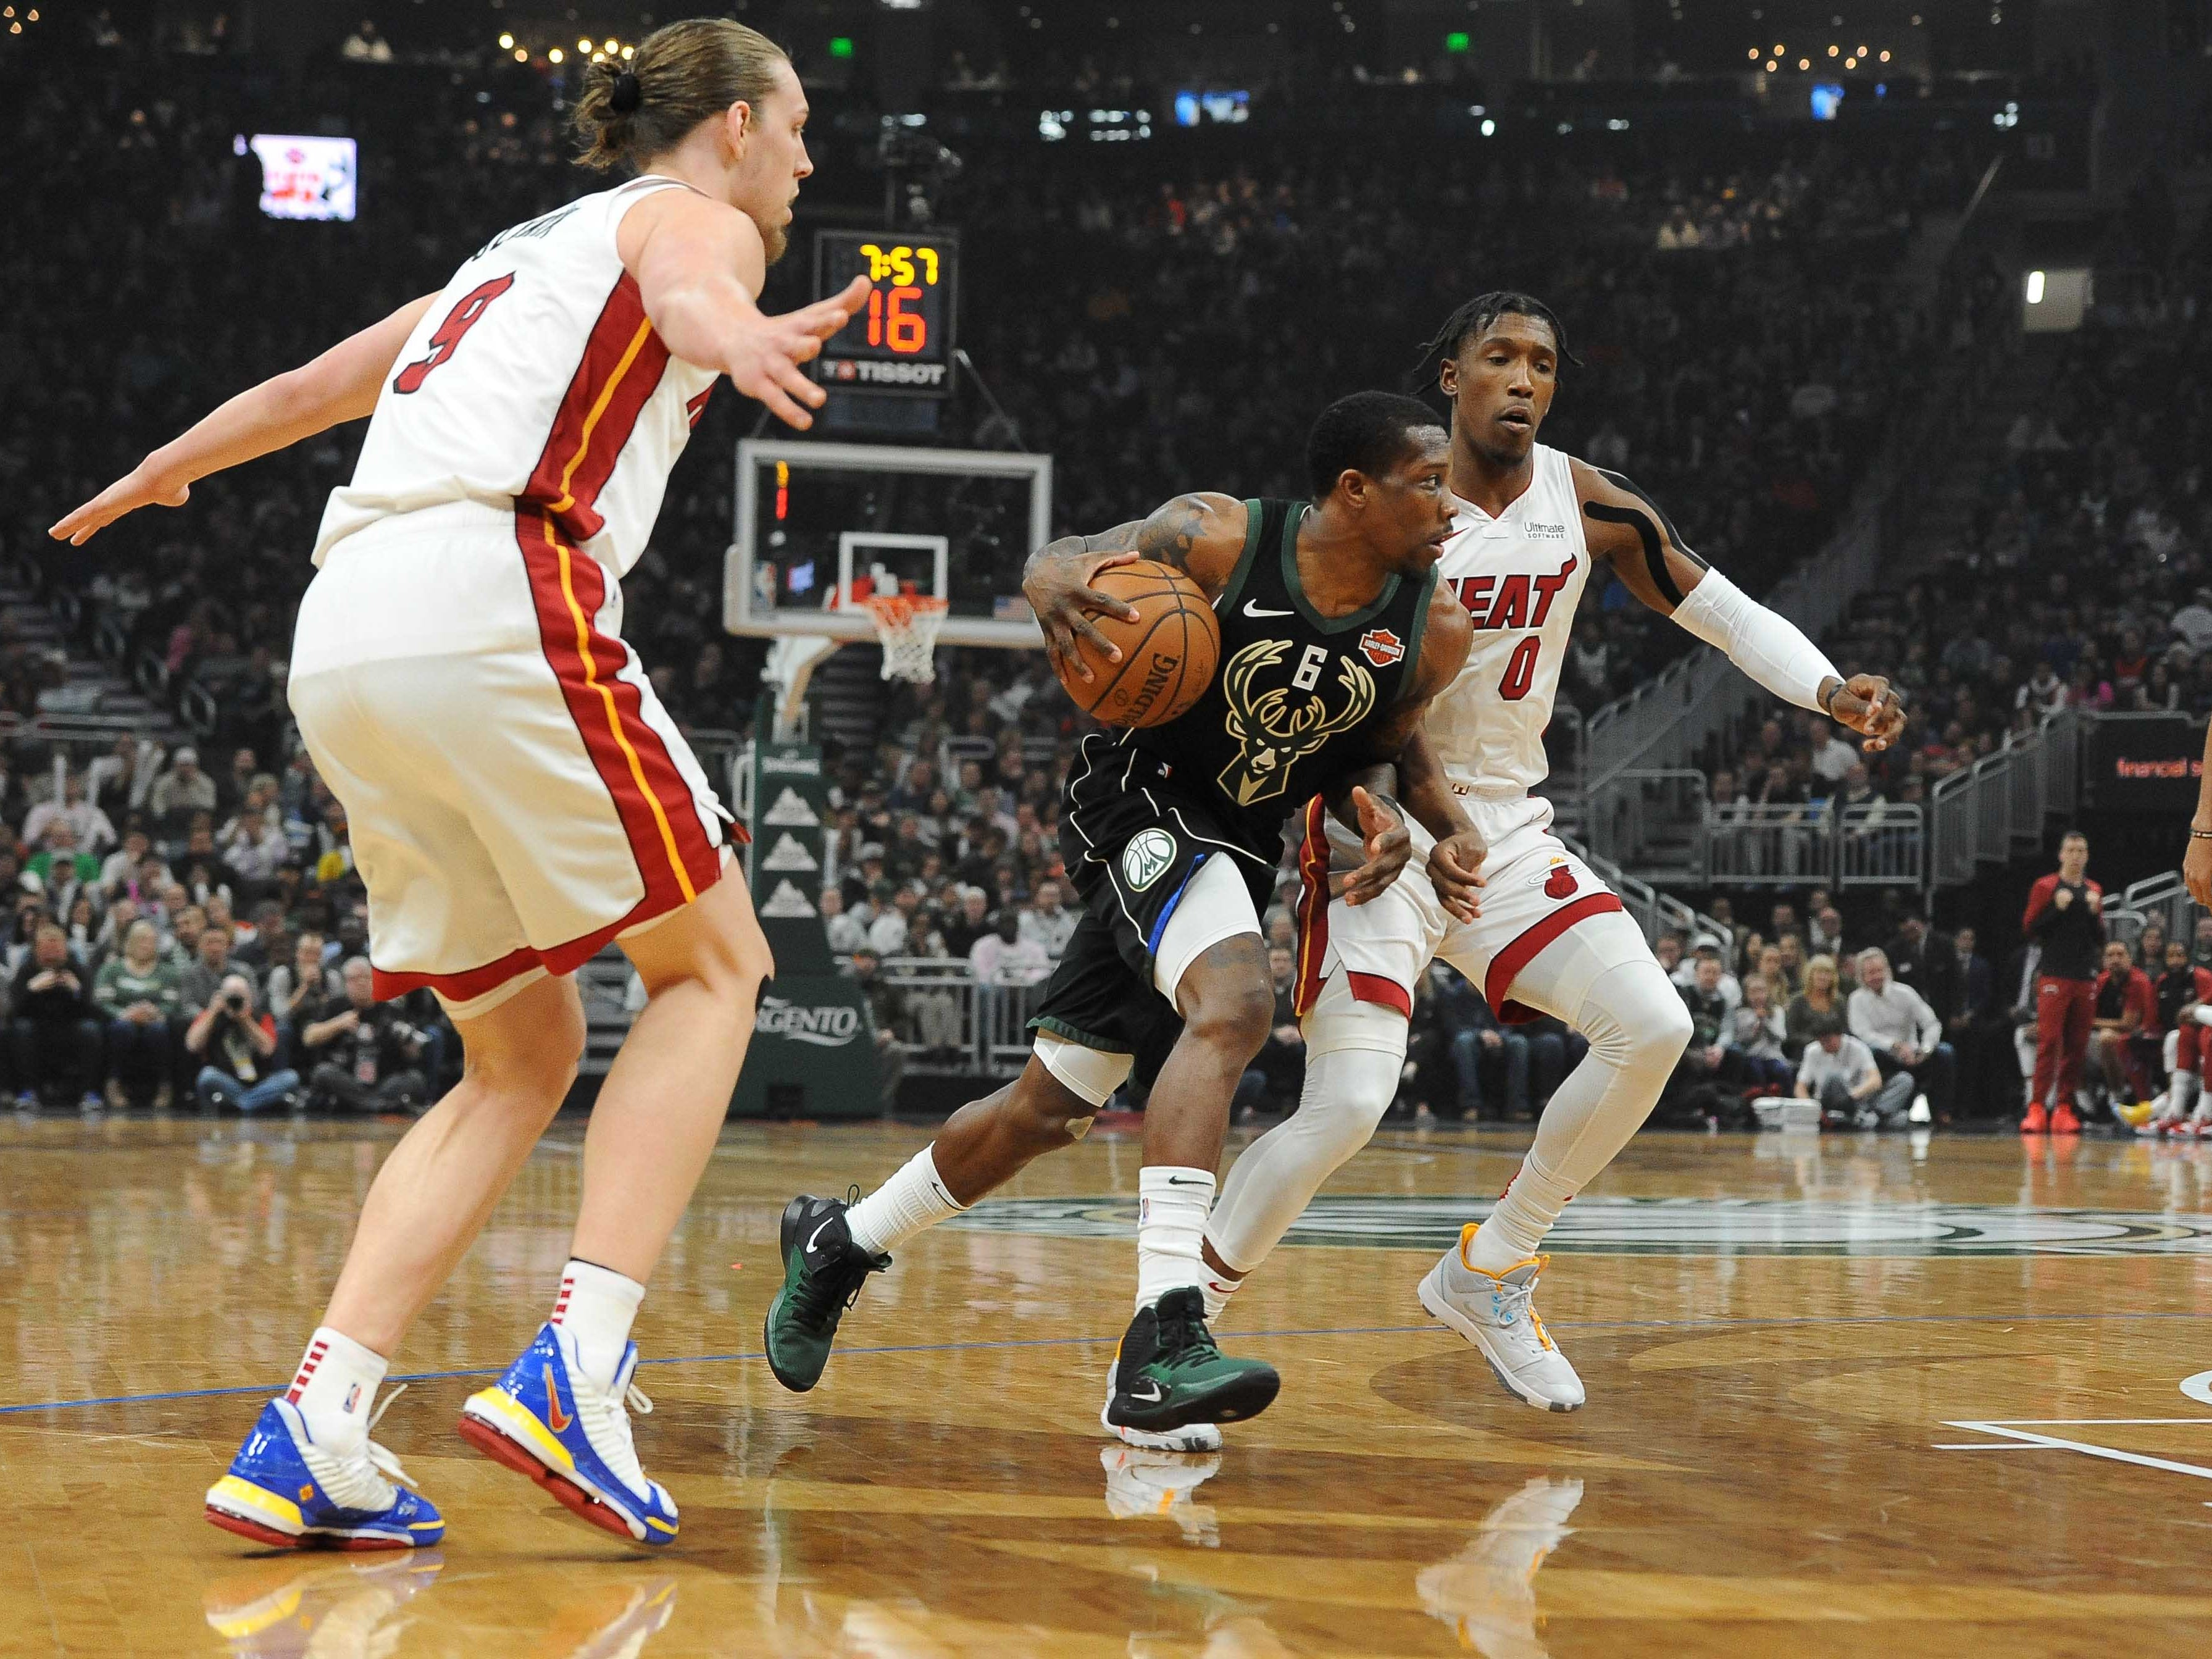 Bucks guard Eric Bledsoe scans the floor as he drives past Heat guard Josh Richardson during the first quarter.